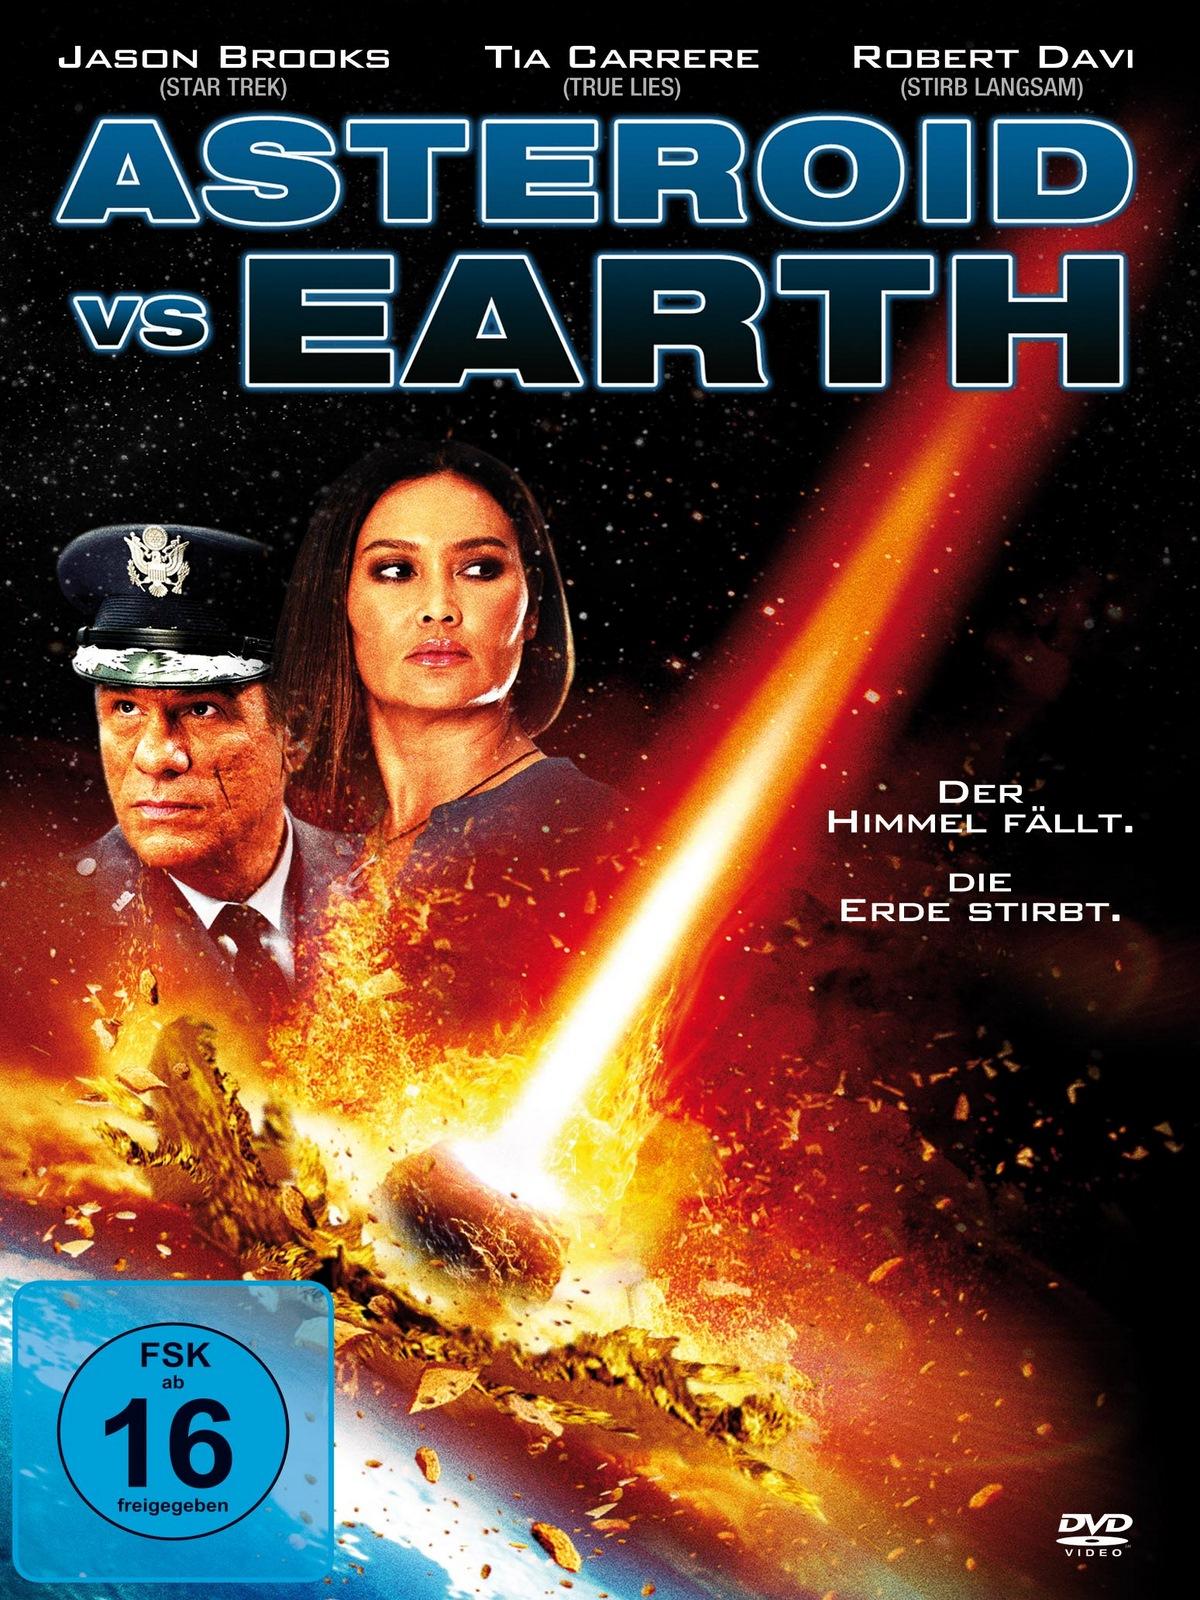 asteroid vs earth dvd - photo #12